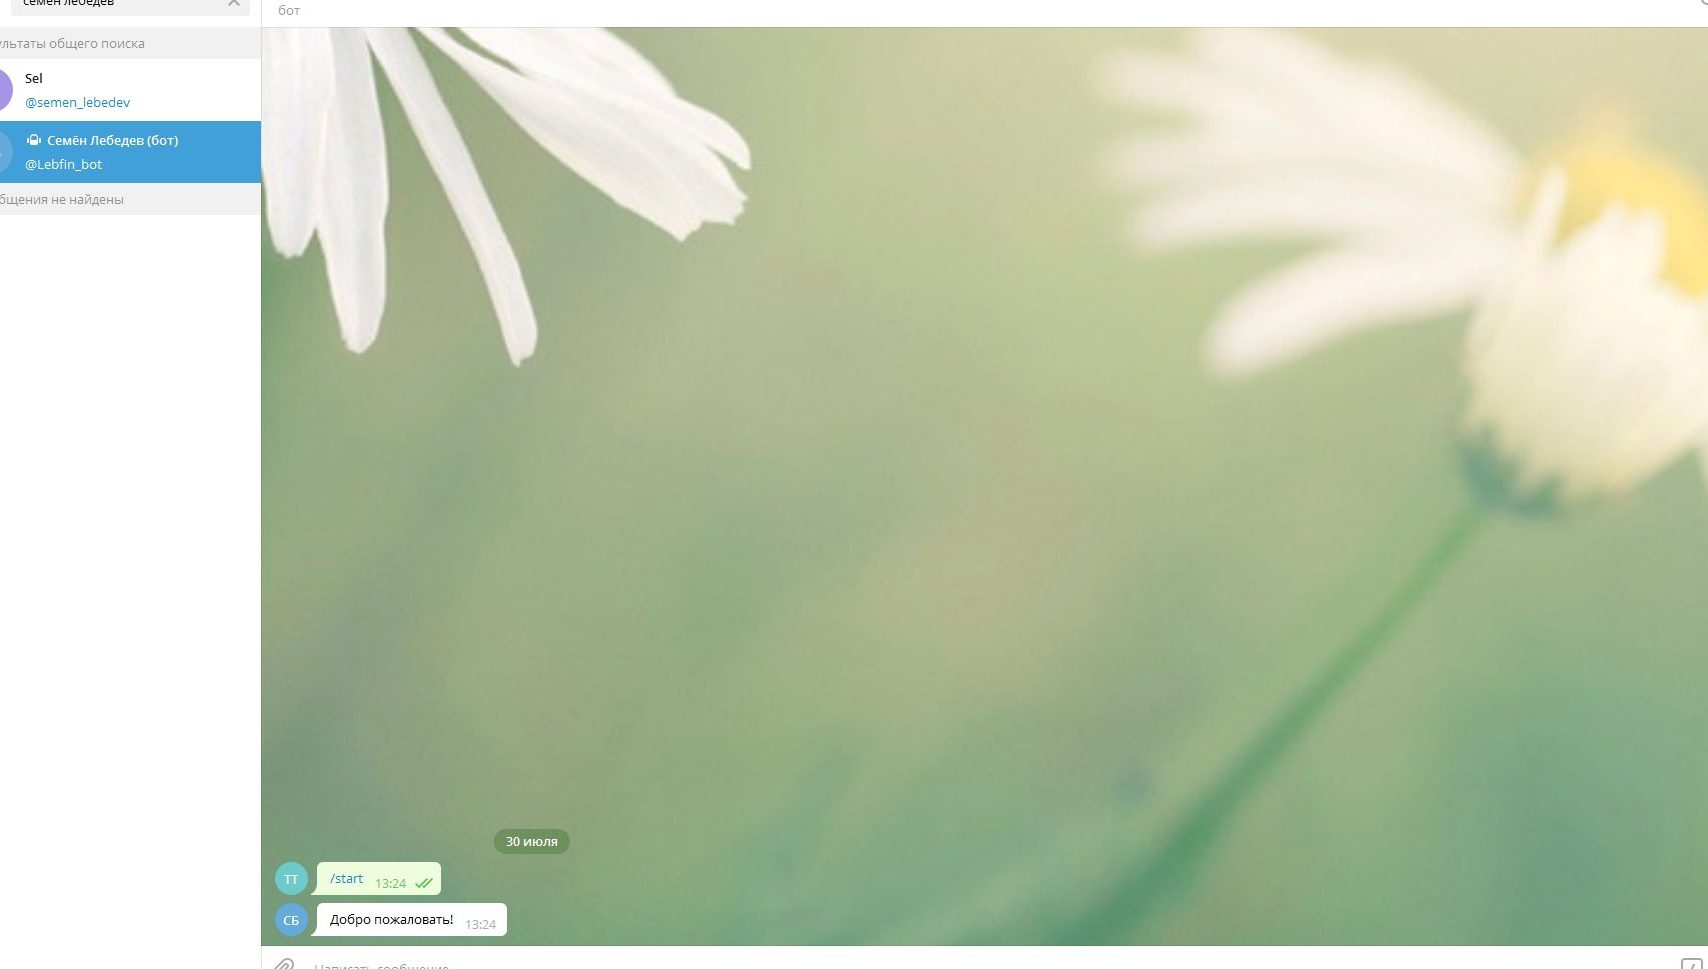 Бот в Телеграм Лебедев